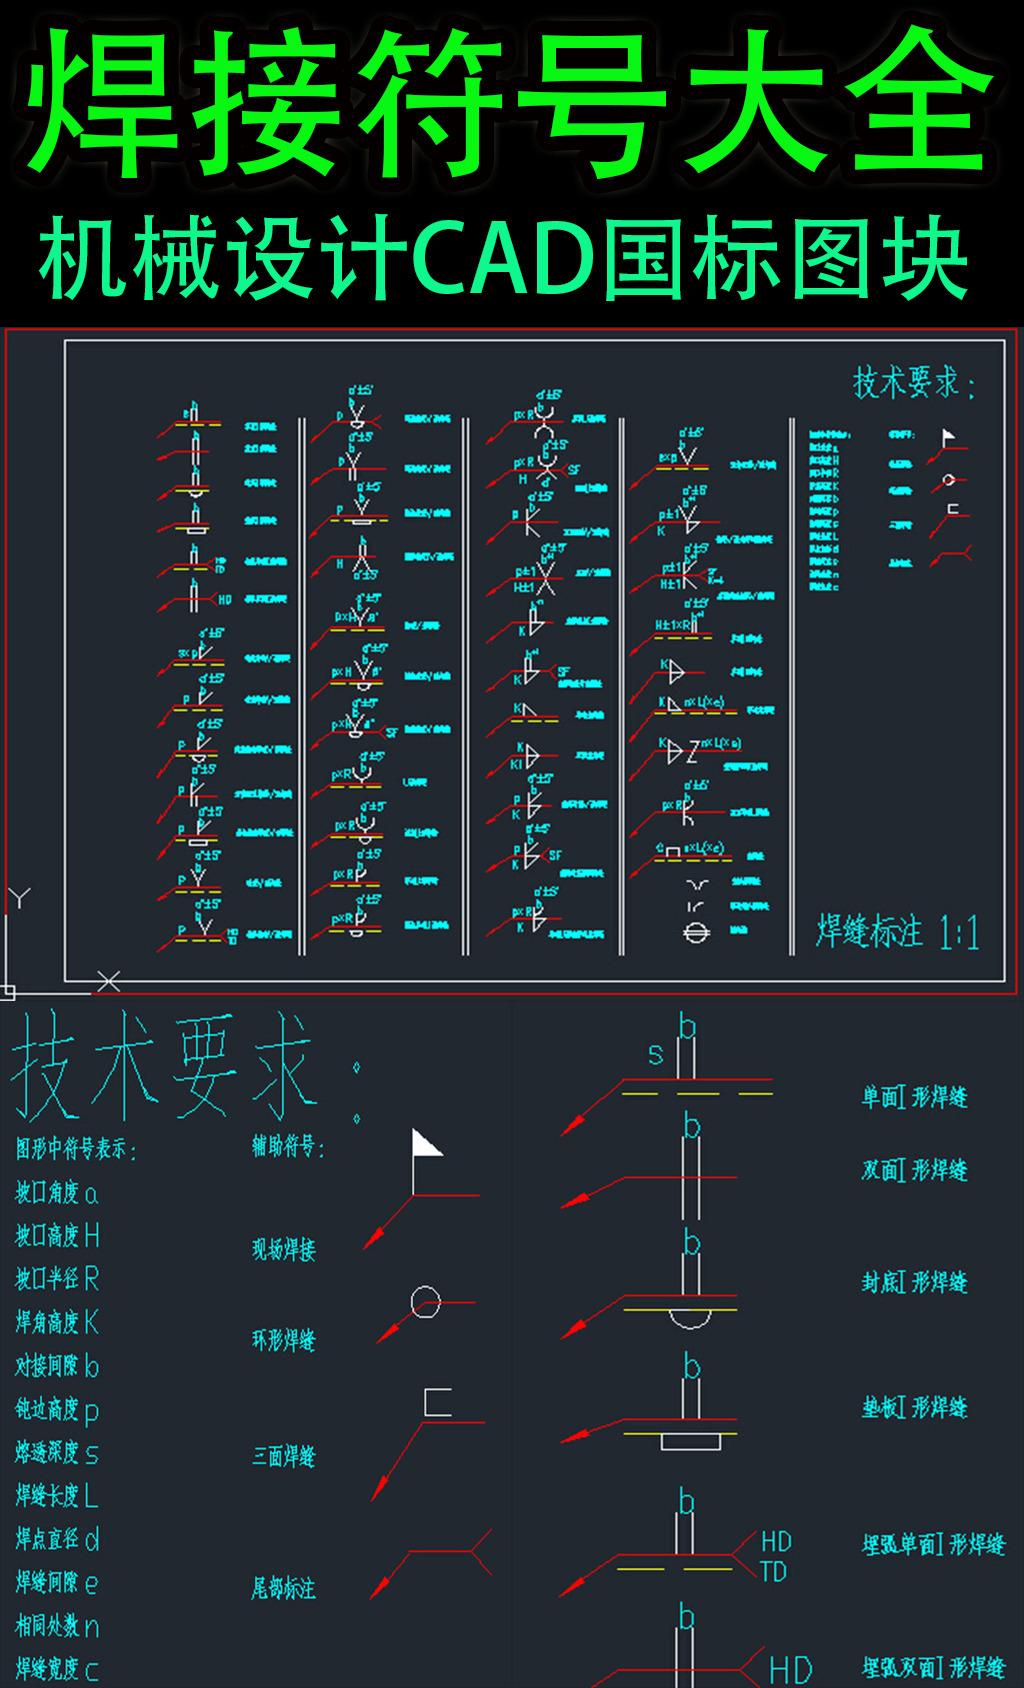 cad焊接符号图库下载模板下载(图片编号:12110943)